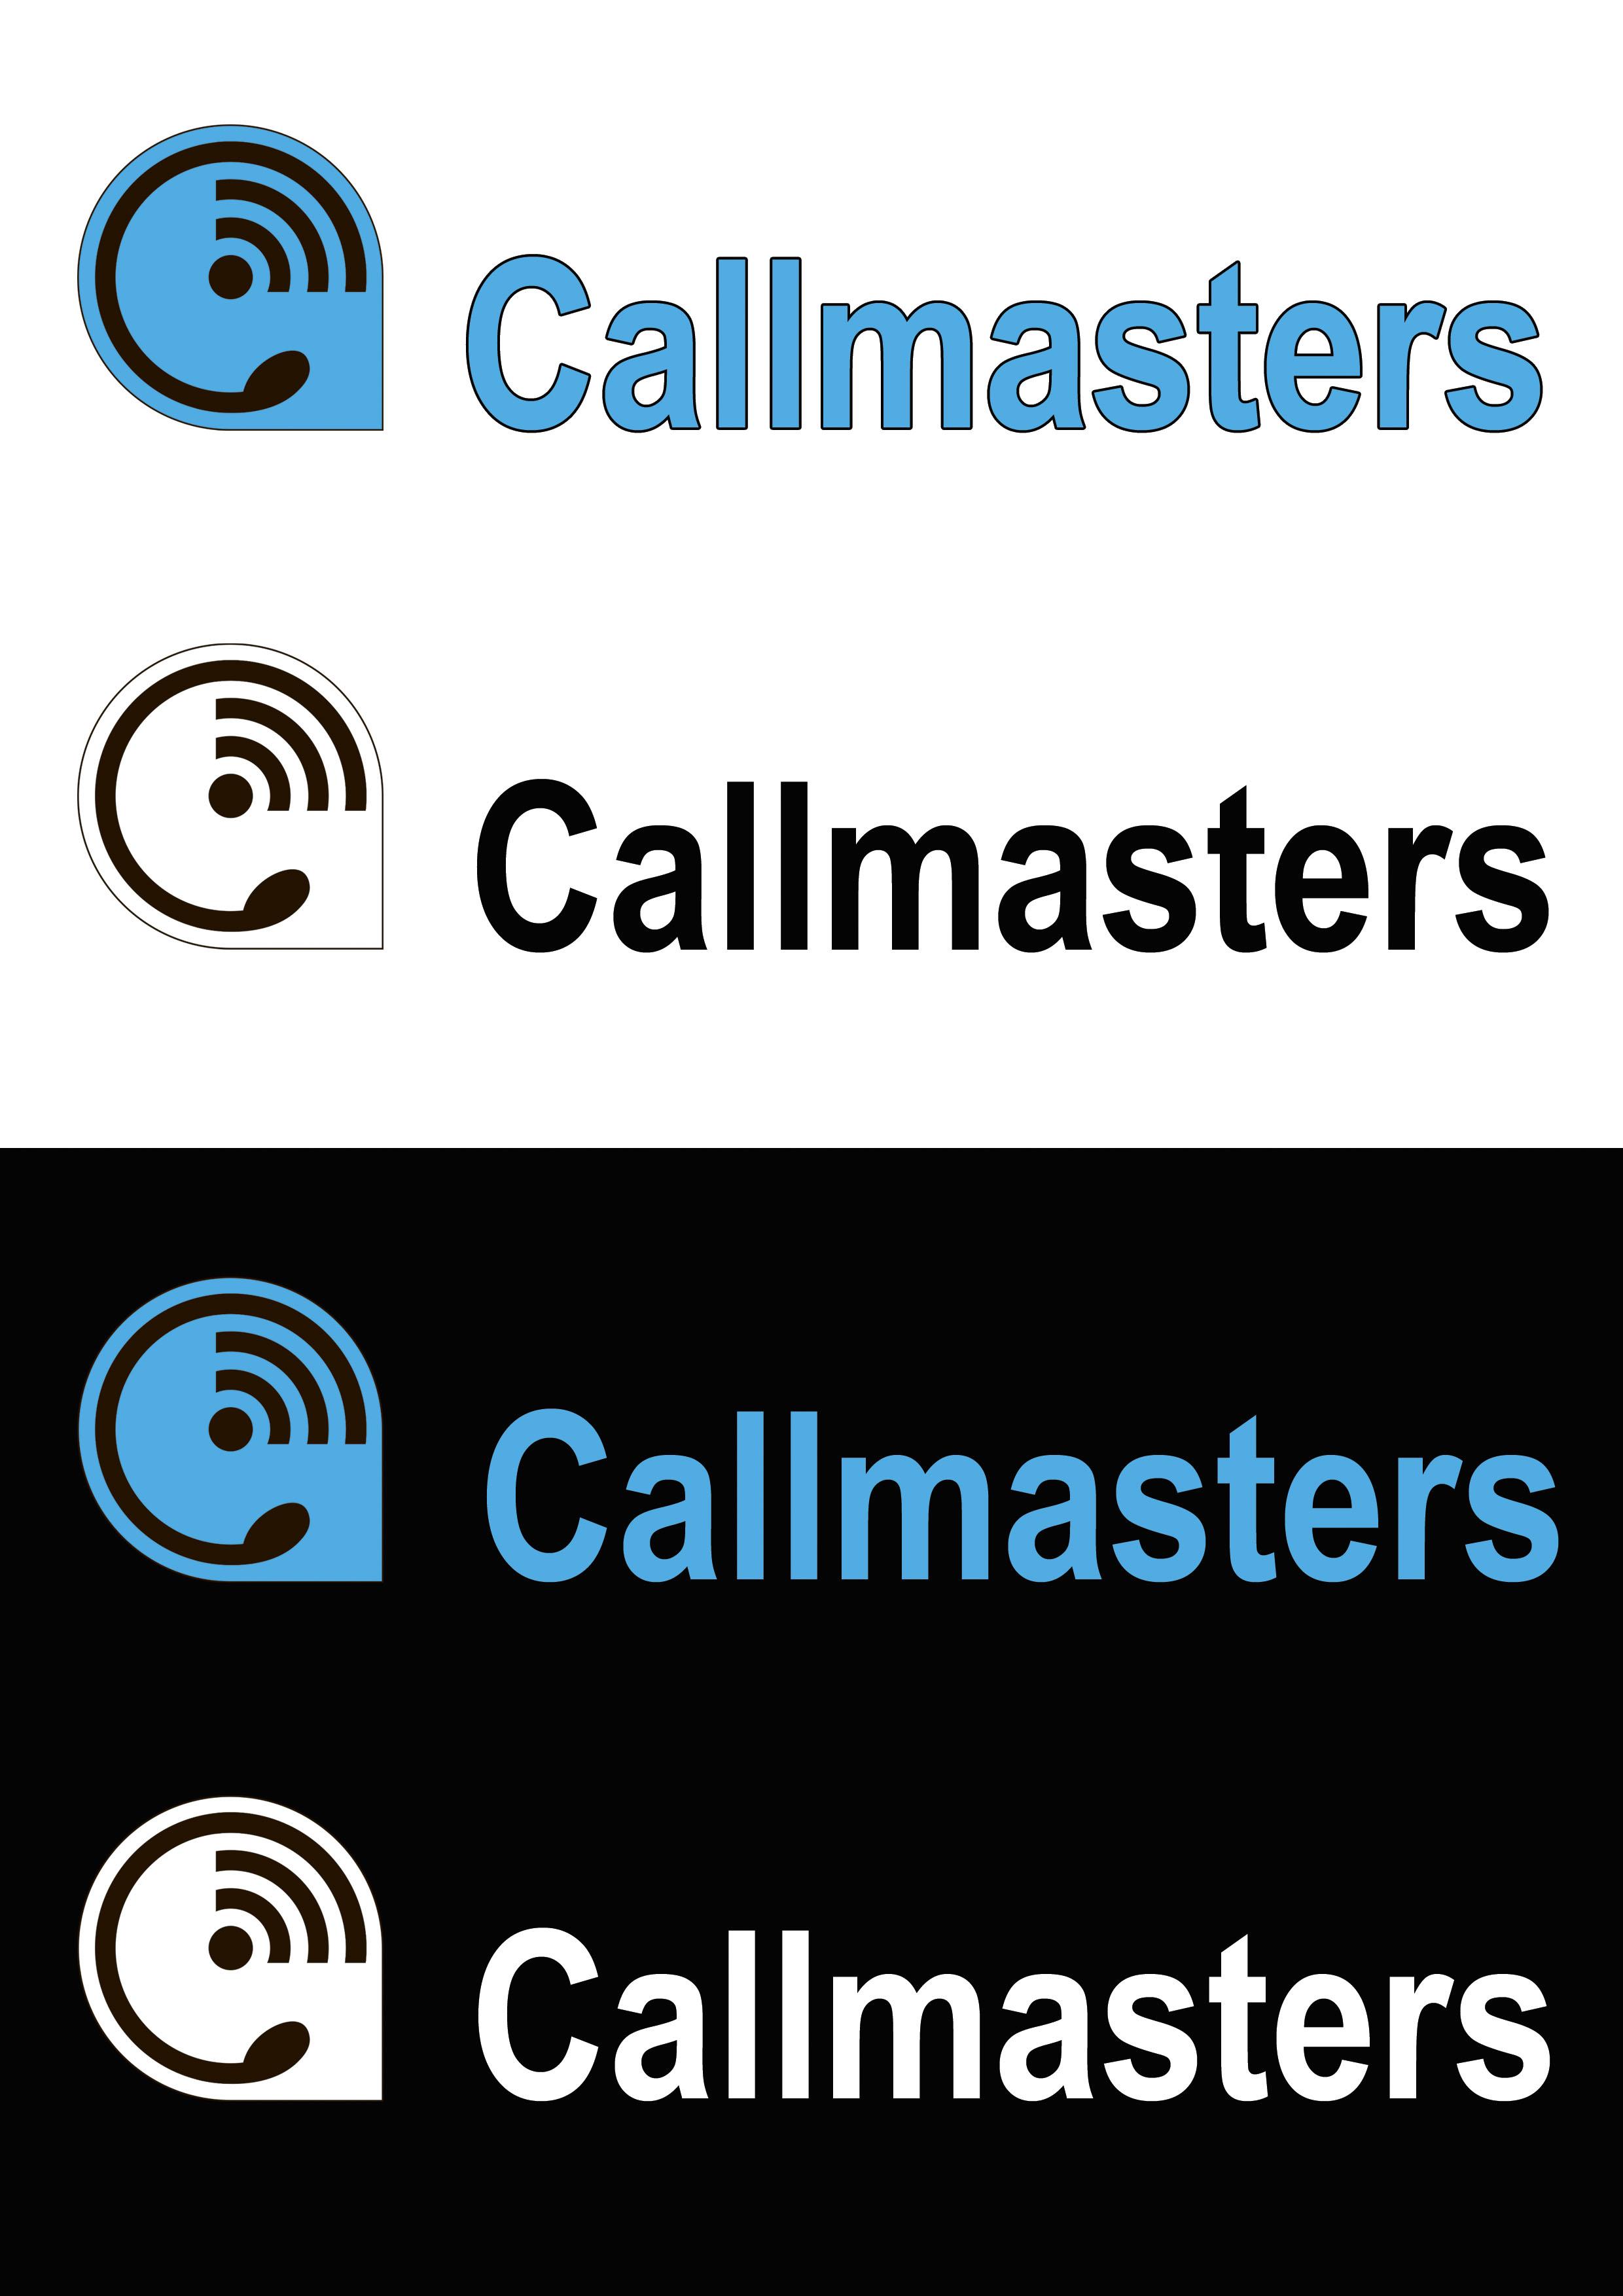 Логотип call-центра Callmasters  фото f_1735b75af0803308.jpg